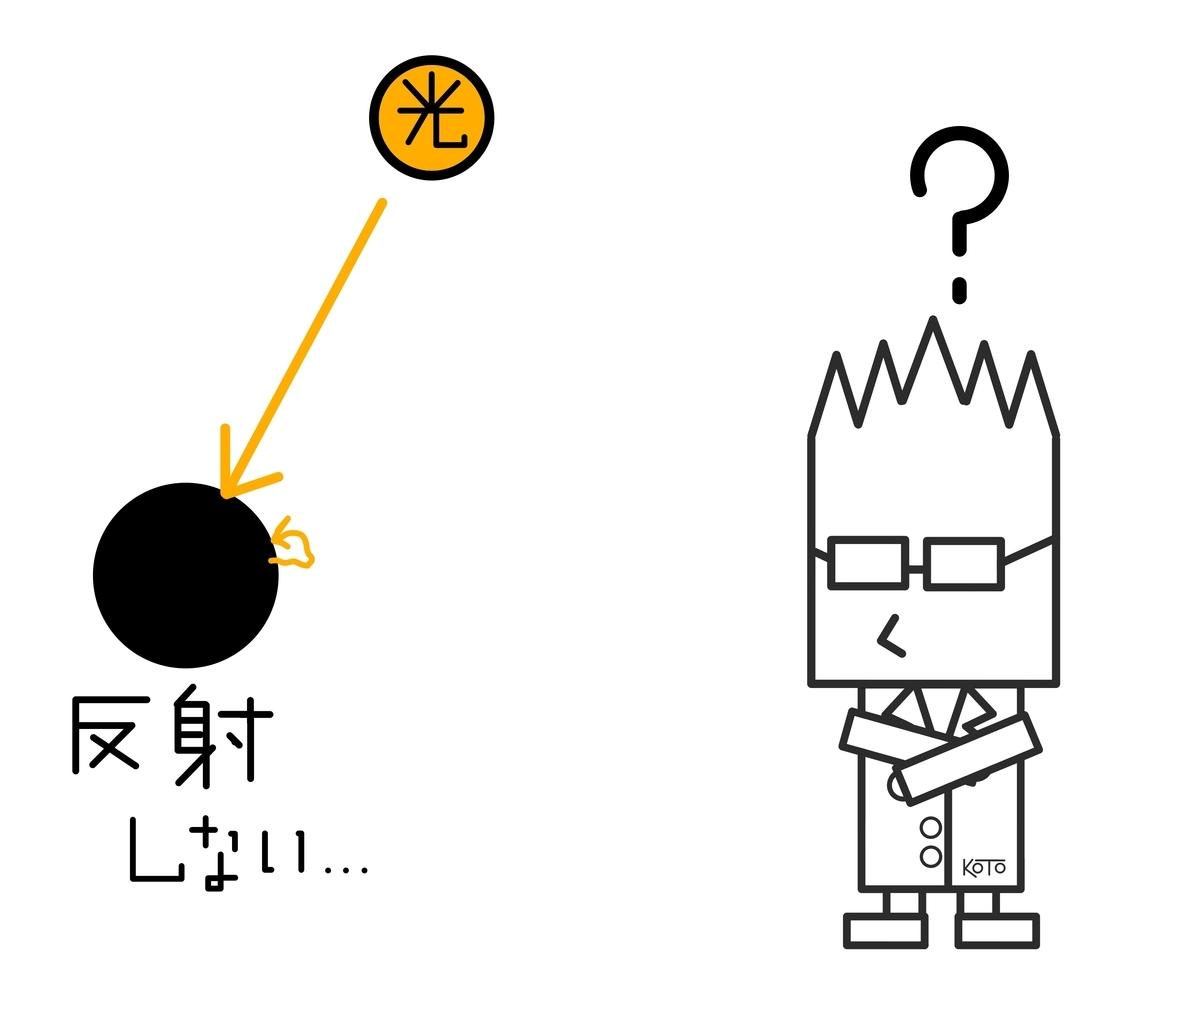 f:id:kotosanagi:20190410214908j:plain